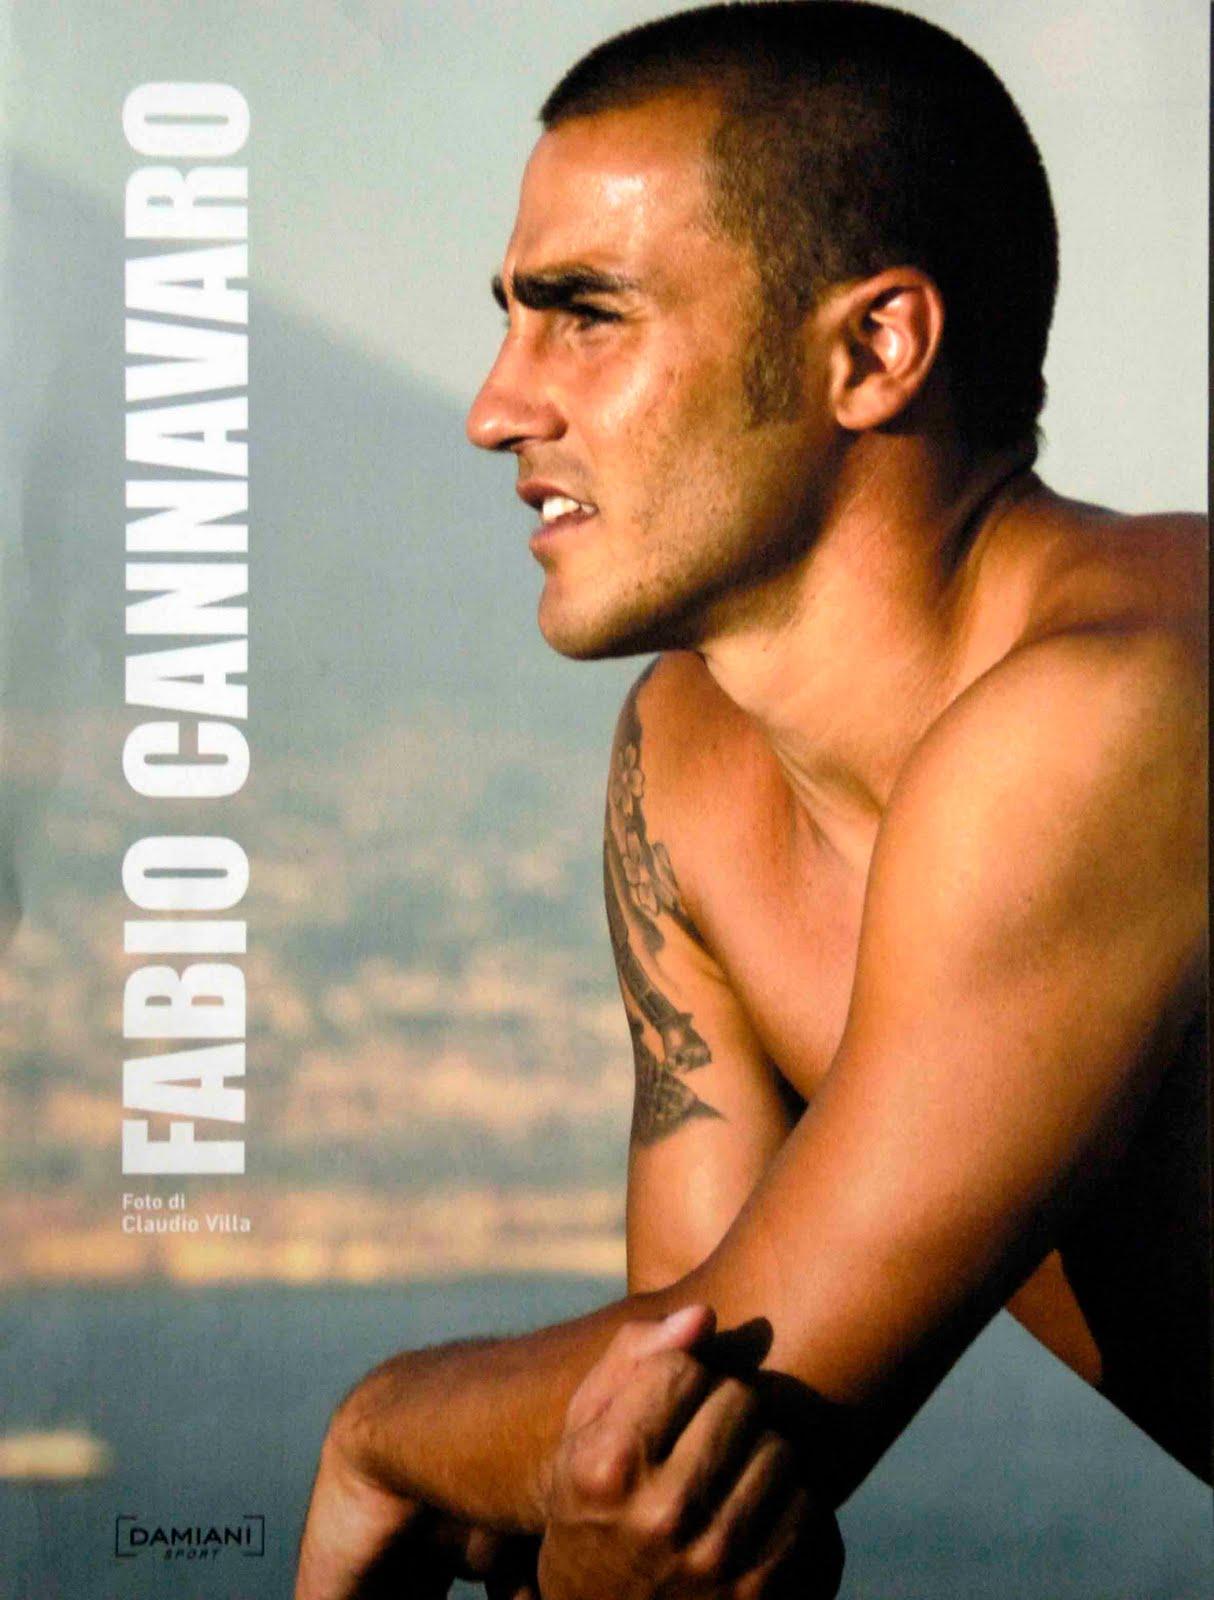 The Best Footballers Fabio Cannavaro desktop wallpaper